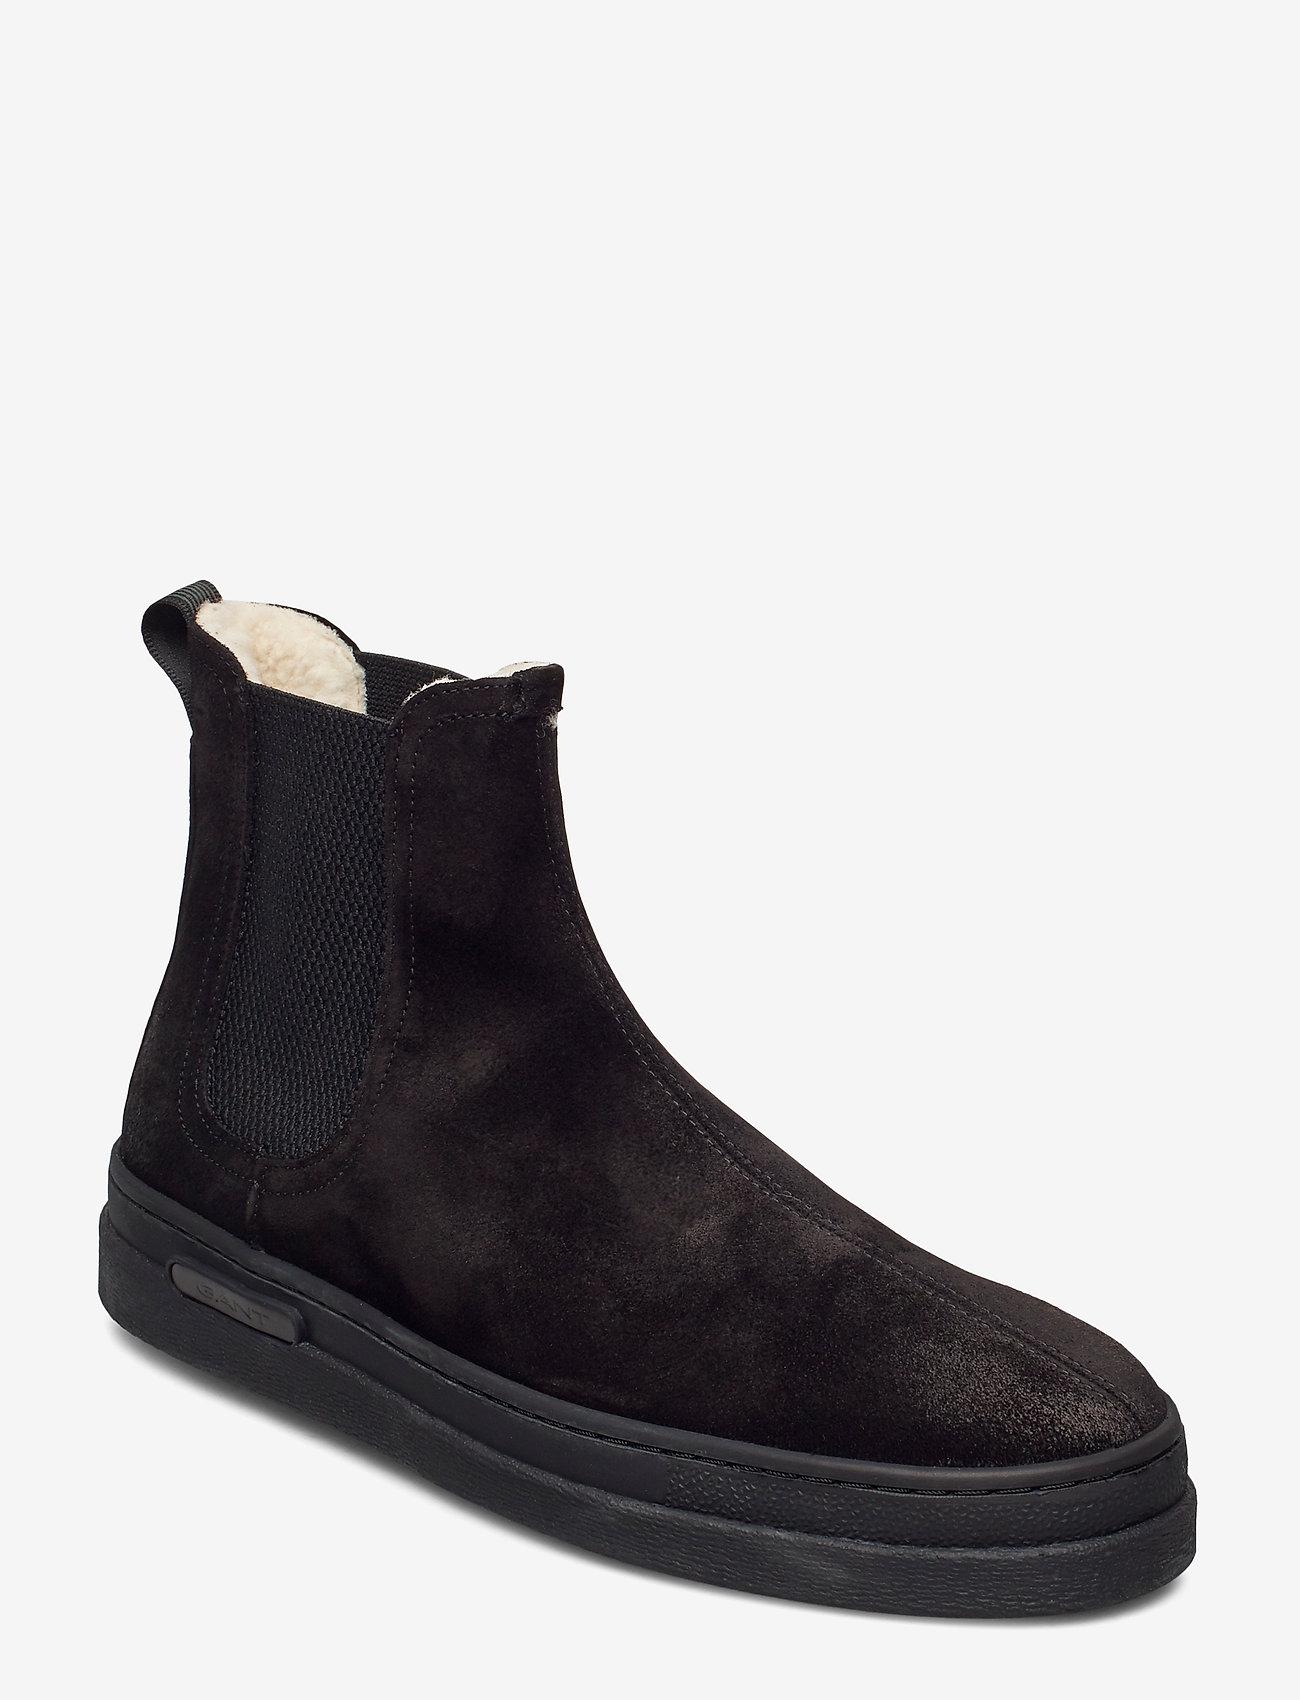 GANT - Cloyd Chelsea - winter boots - black - 0